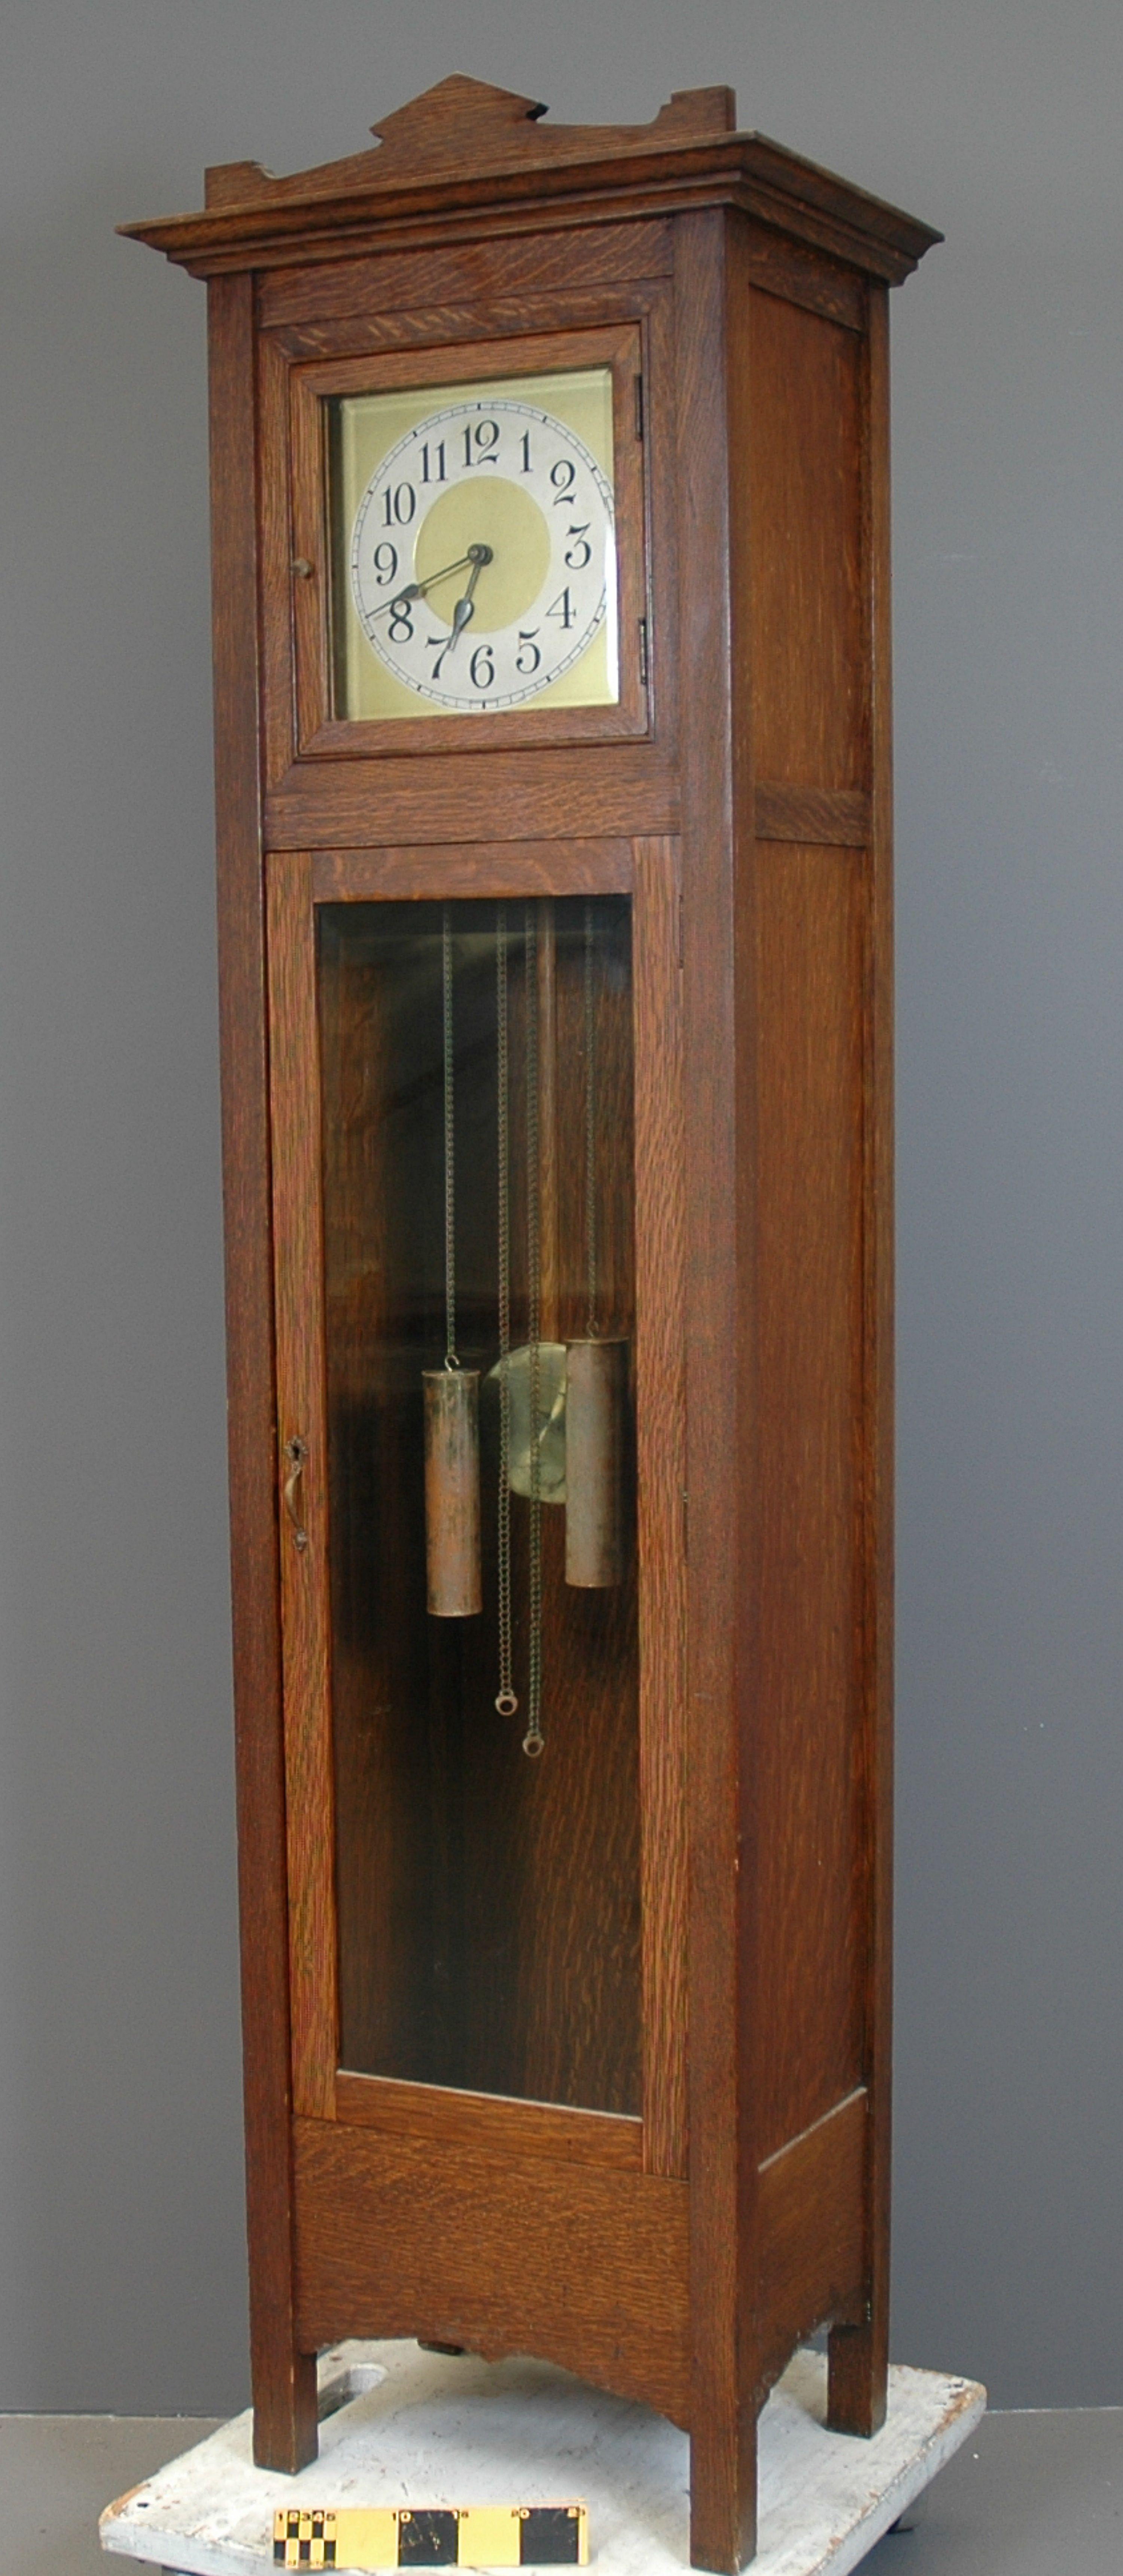 1918 pequegnat halifax grandfather clock clock furniture time 1918 pequegnat halifax grandfather clock clock furniture time amipublicfo Images